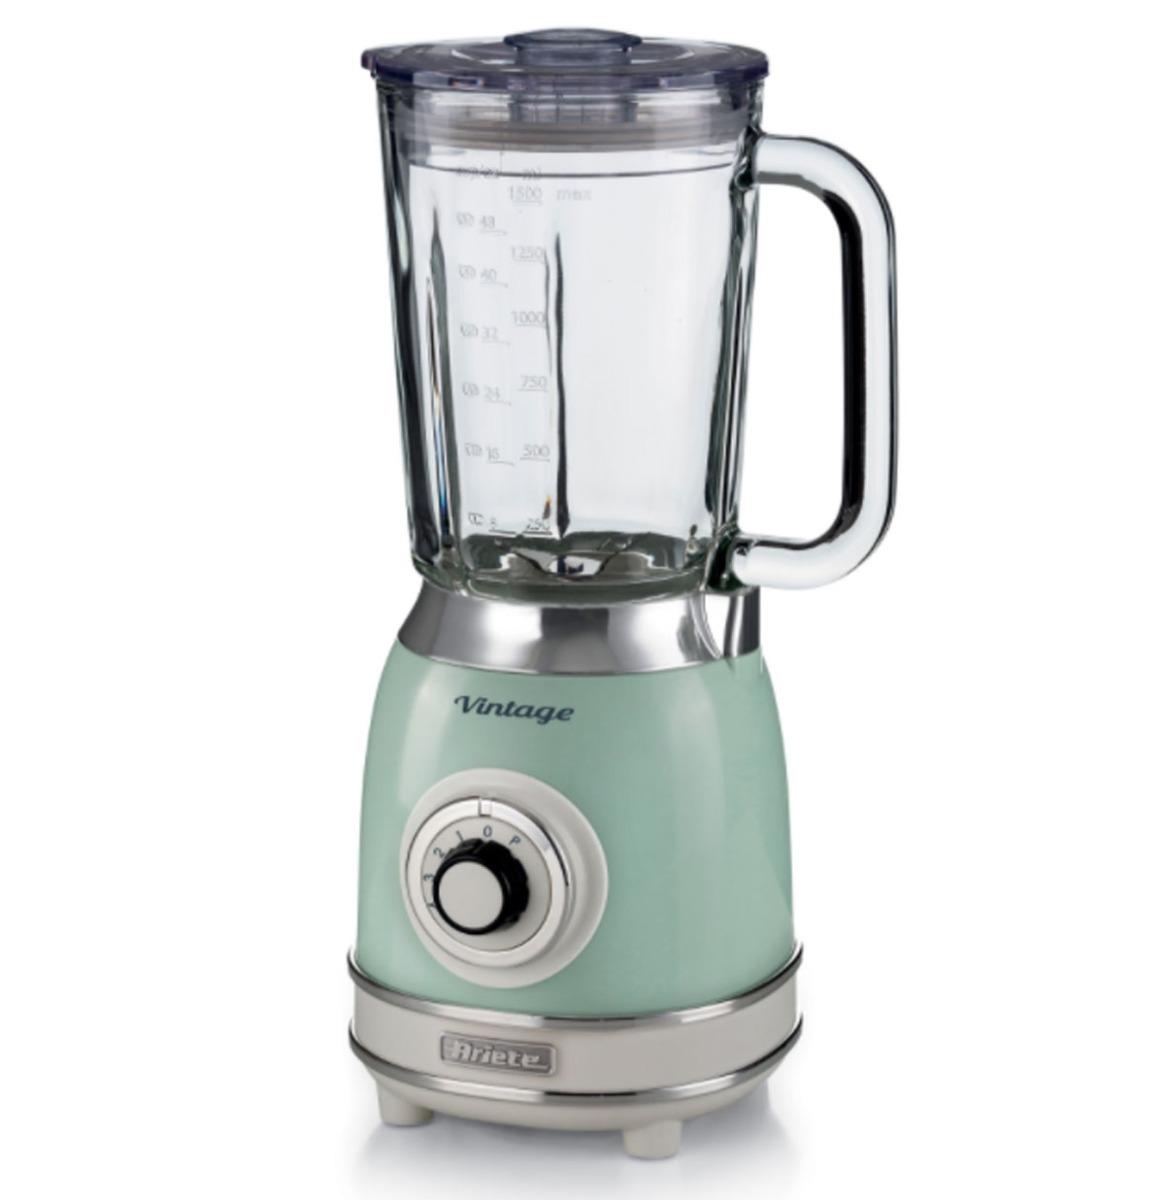 Ariete Vintage Blender - 1000 Watt - Groen 1,5 Liter